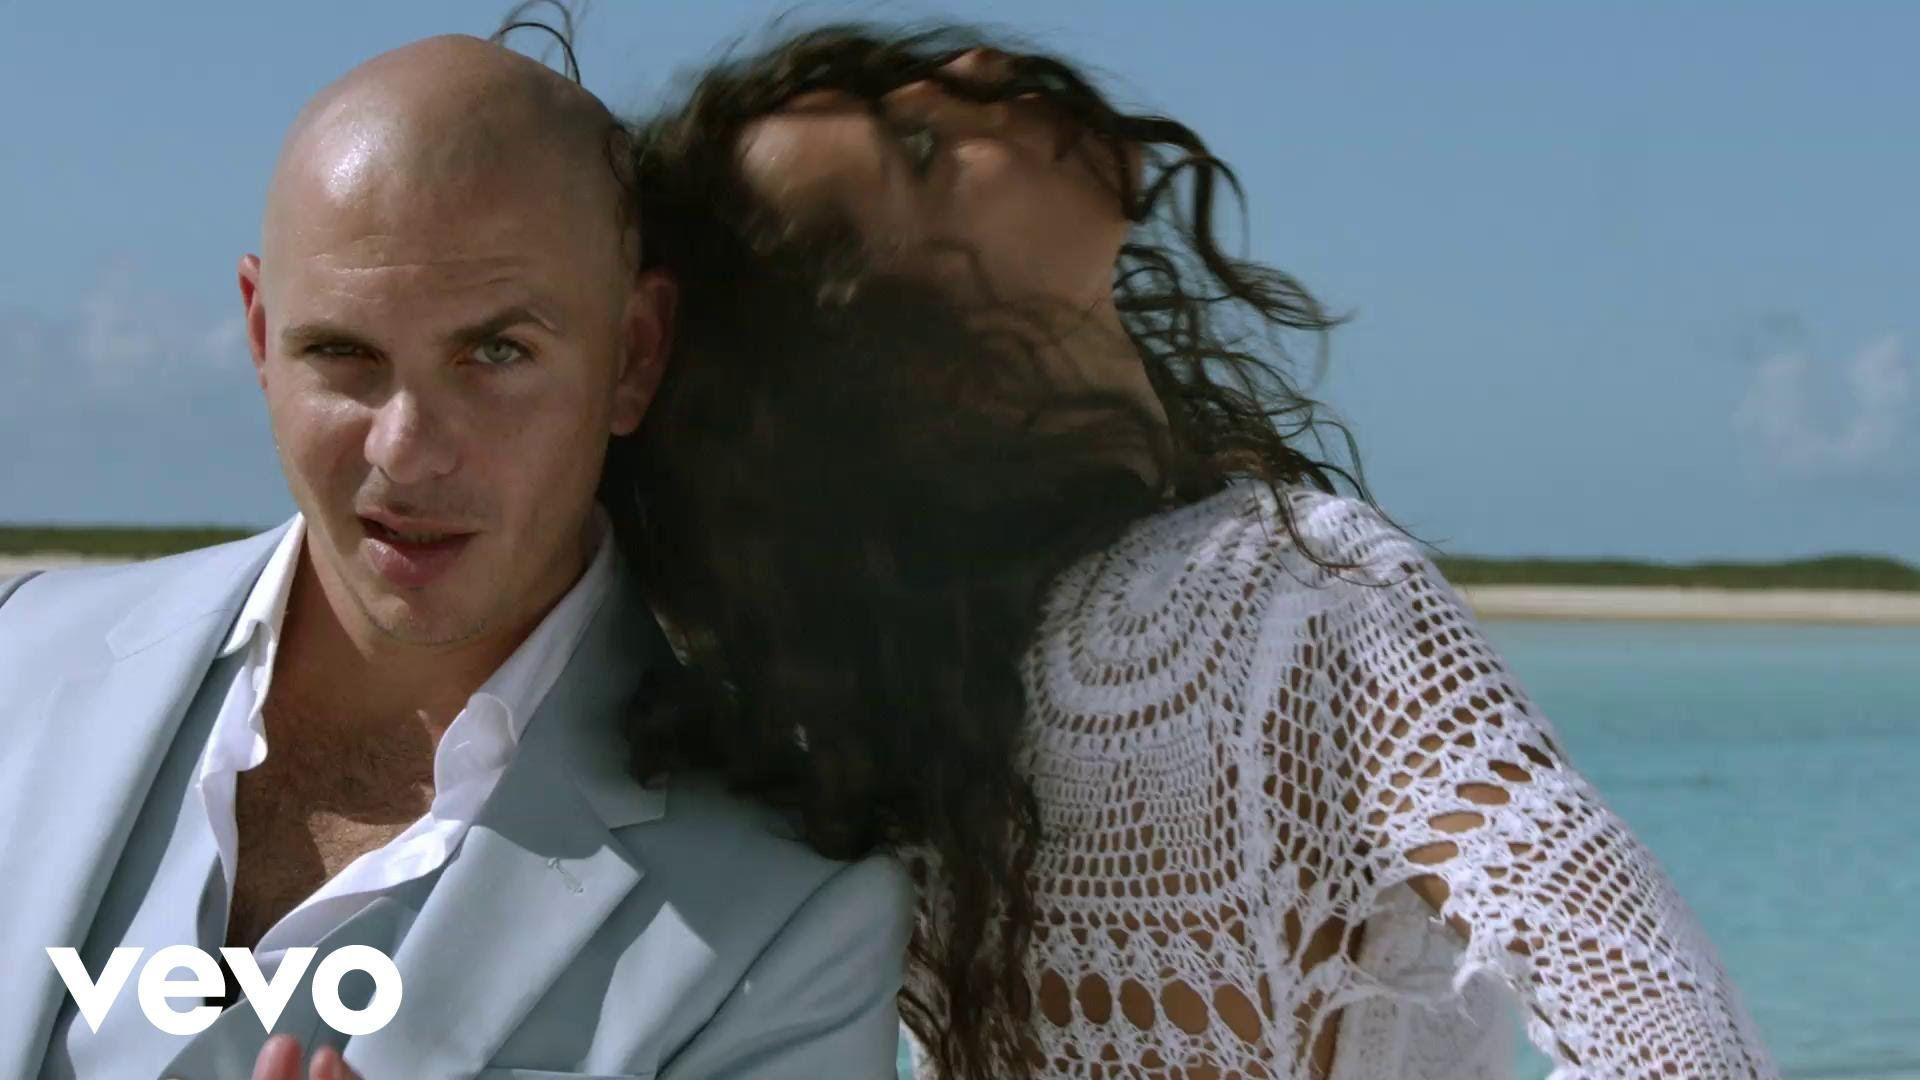 Pitbull S Official Music Video For Timber Ft Kesha Click To Listen To Pitbull On Spotify Http Smarturl It Pbspot Pitbulls Pitbull Rapper American Songs